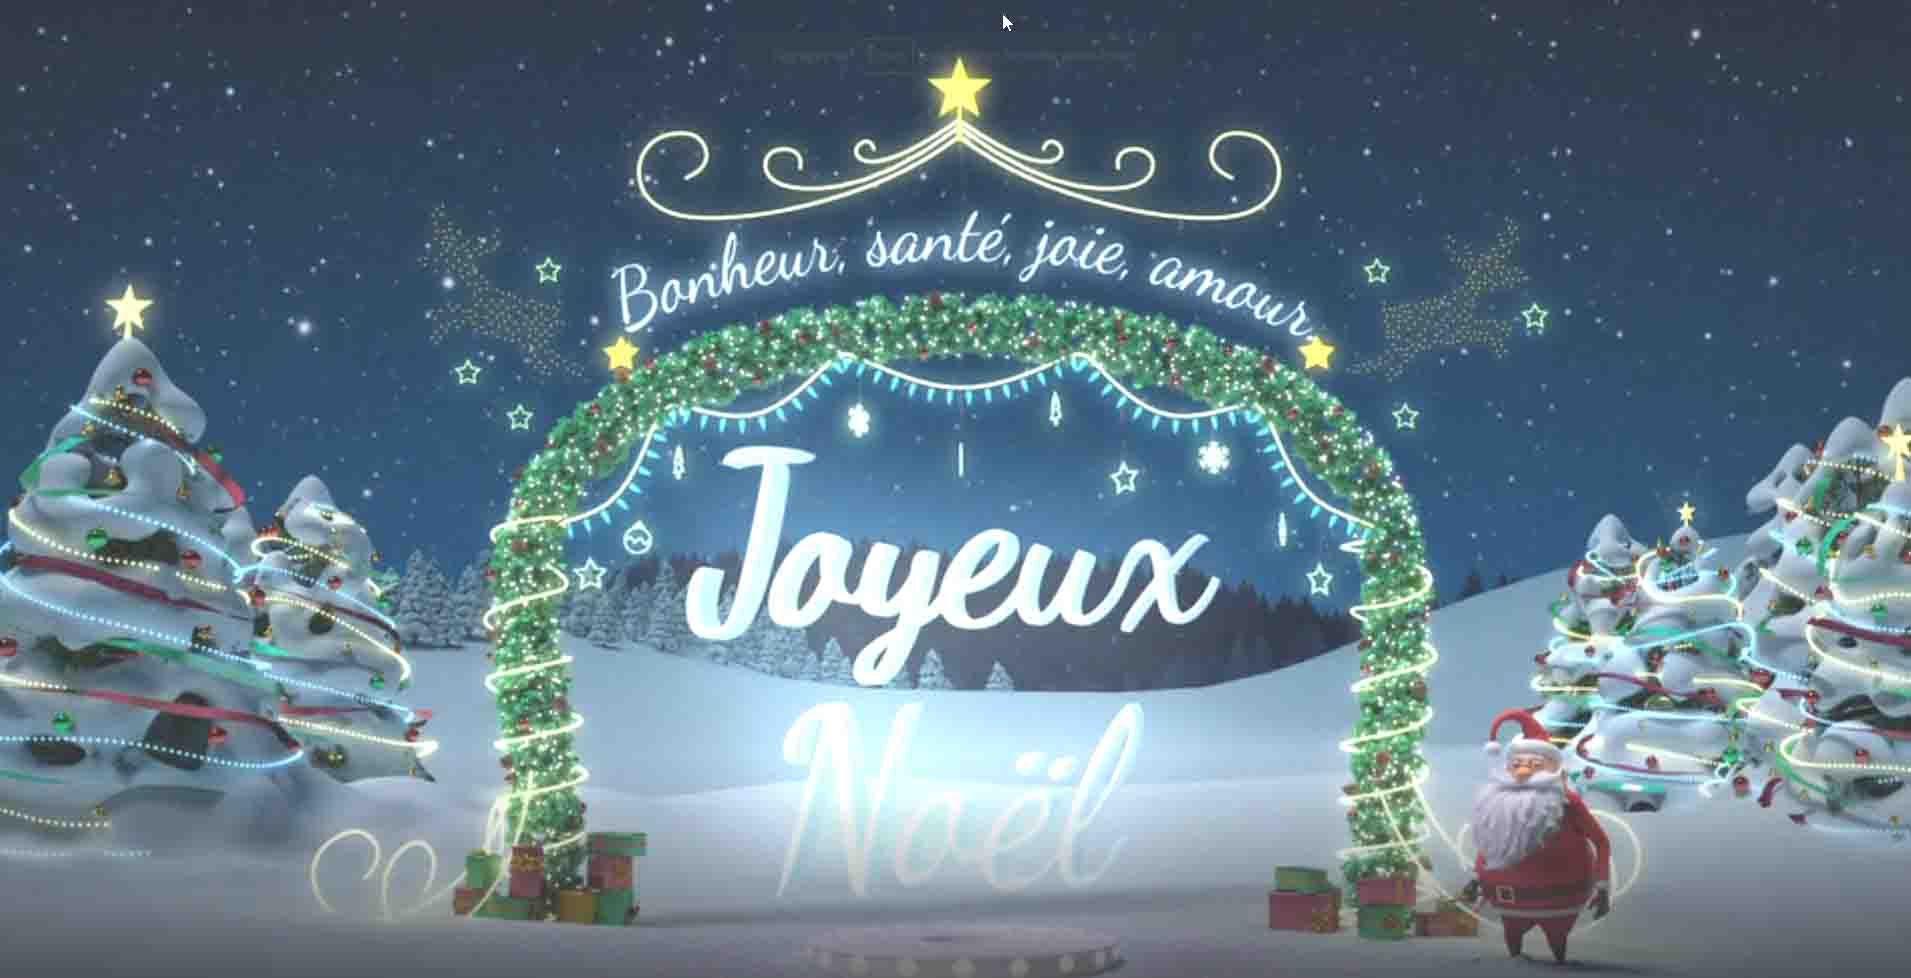 Noel pps noel pps noel humour dessin 2019 | Texte joyeux noel